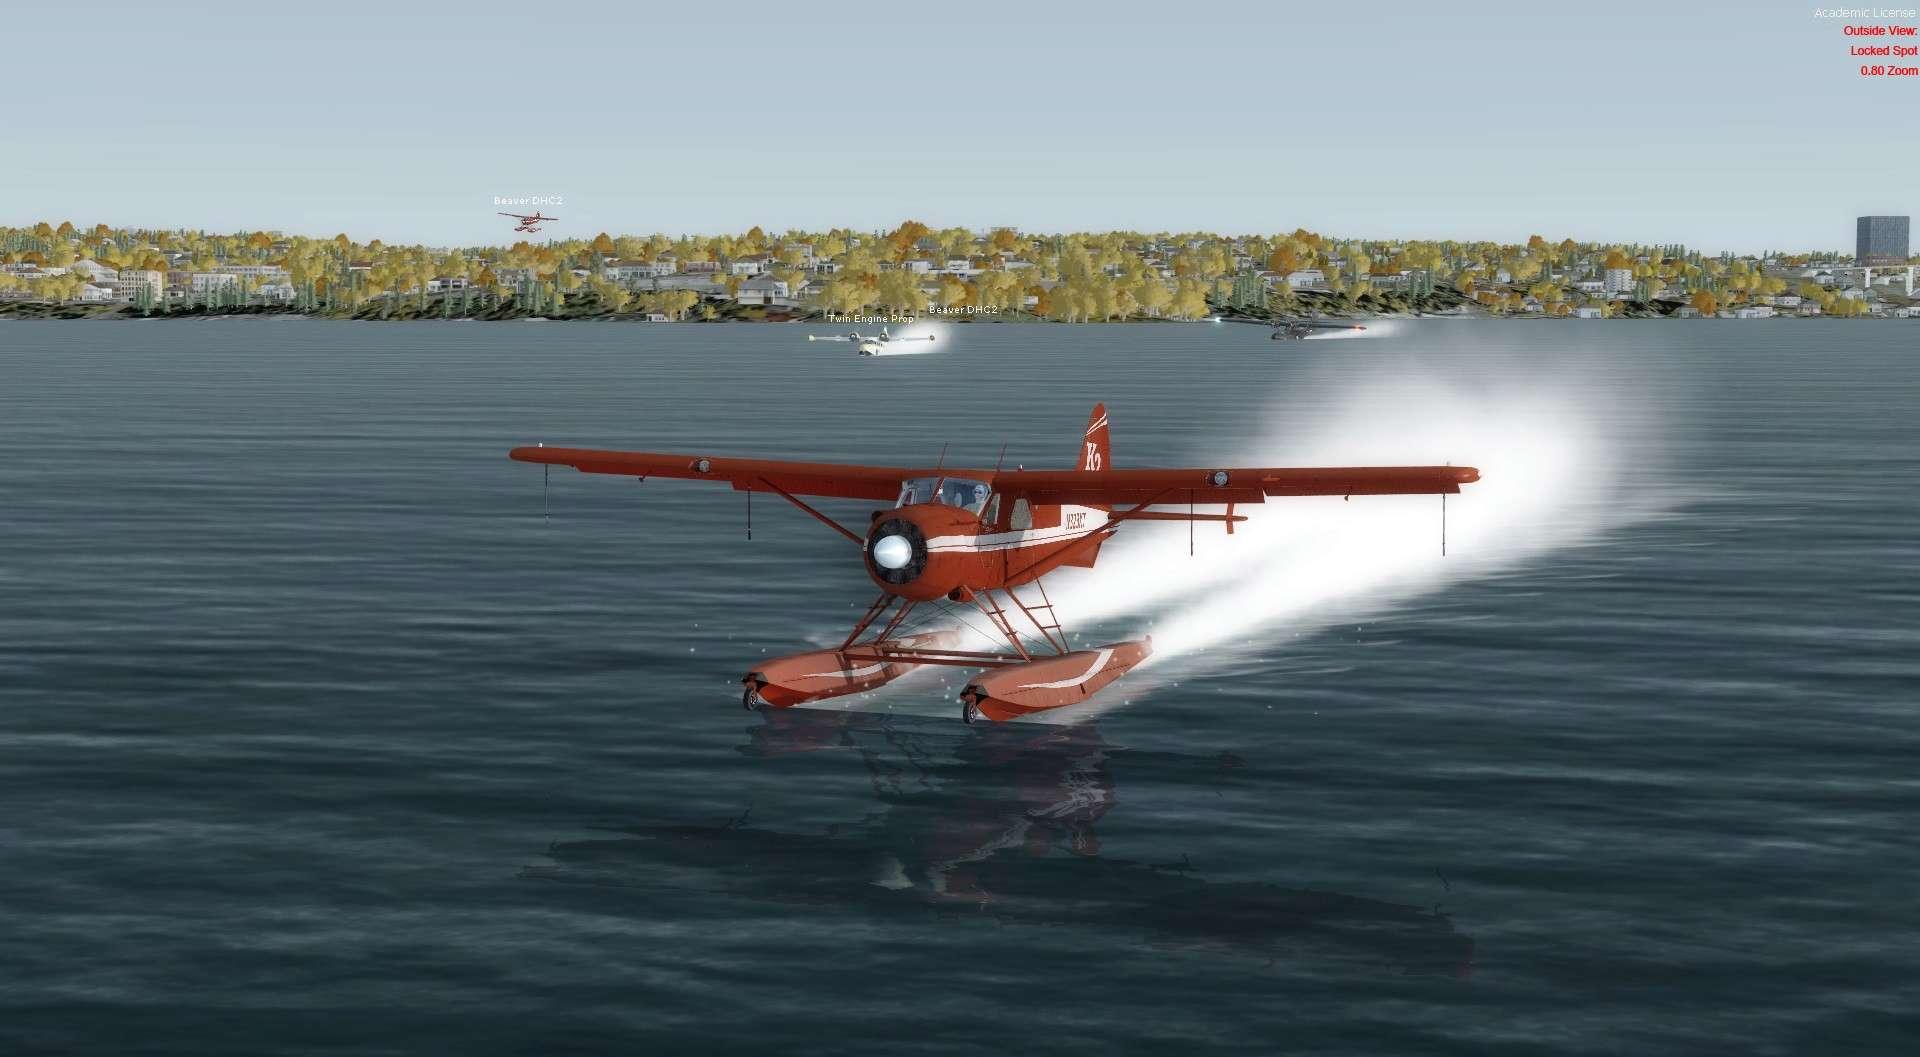 Compte rendu du vol Kenmore Air Harbor (W55) à Kenmore Air Harbor (W55) 2017-118